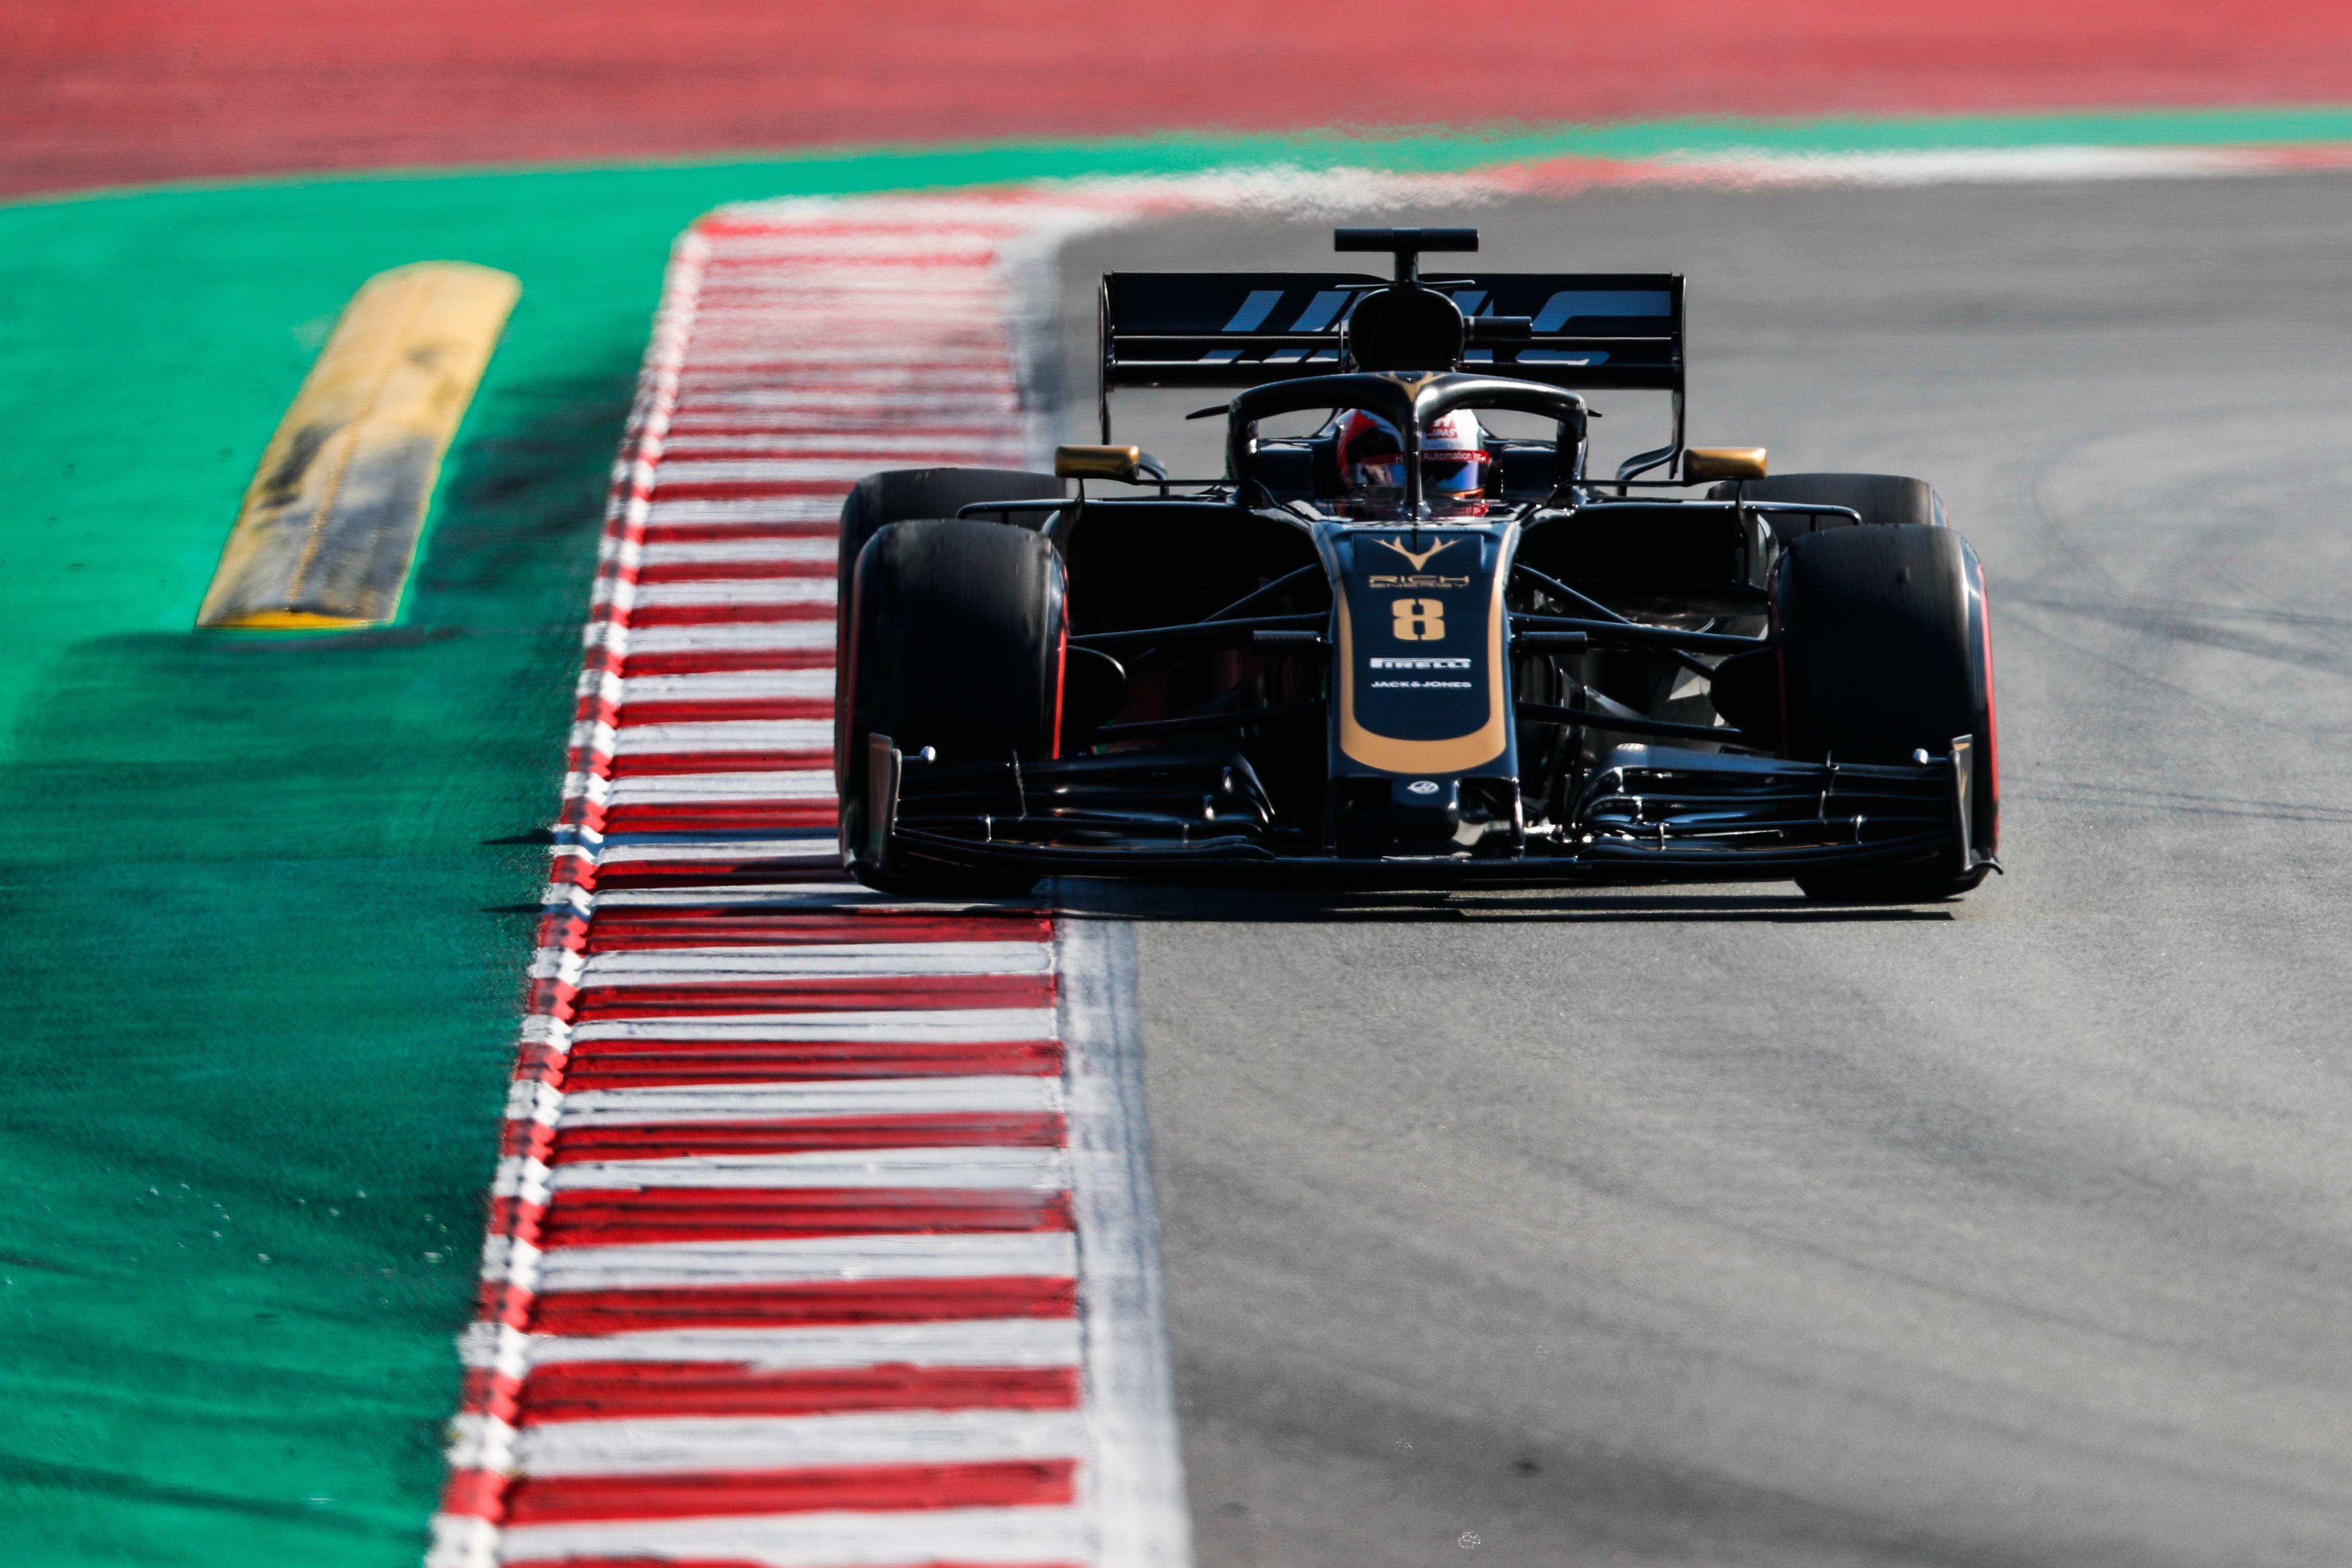 Romain Grosjean, Guenther Steiner, F1 2019